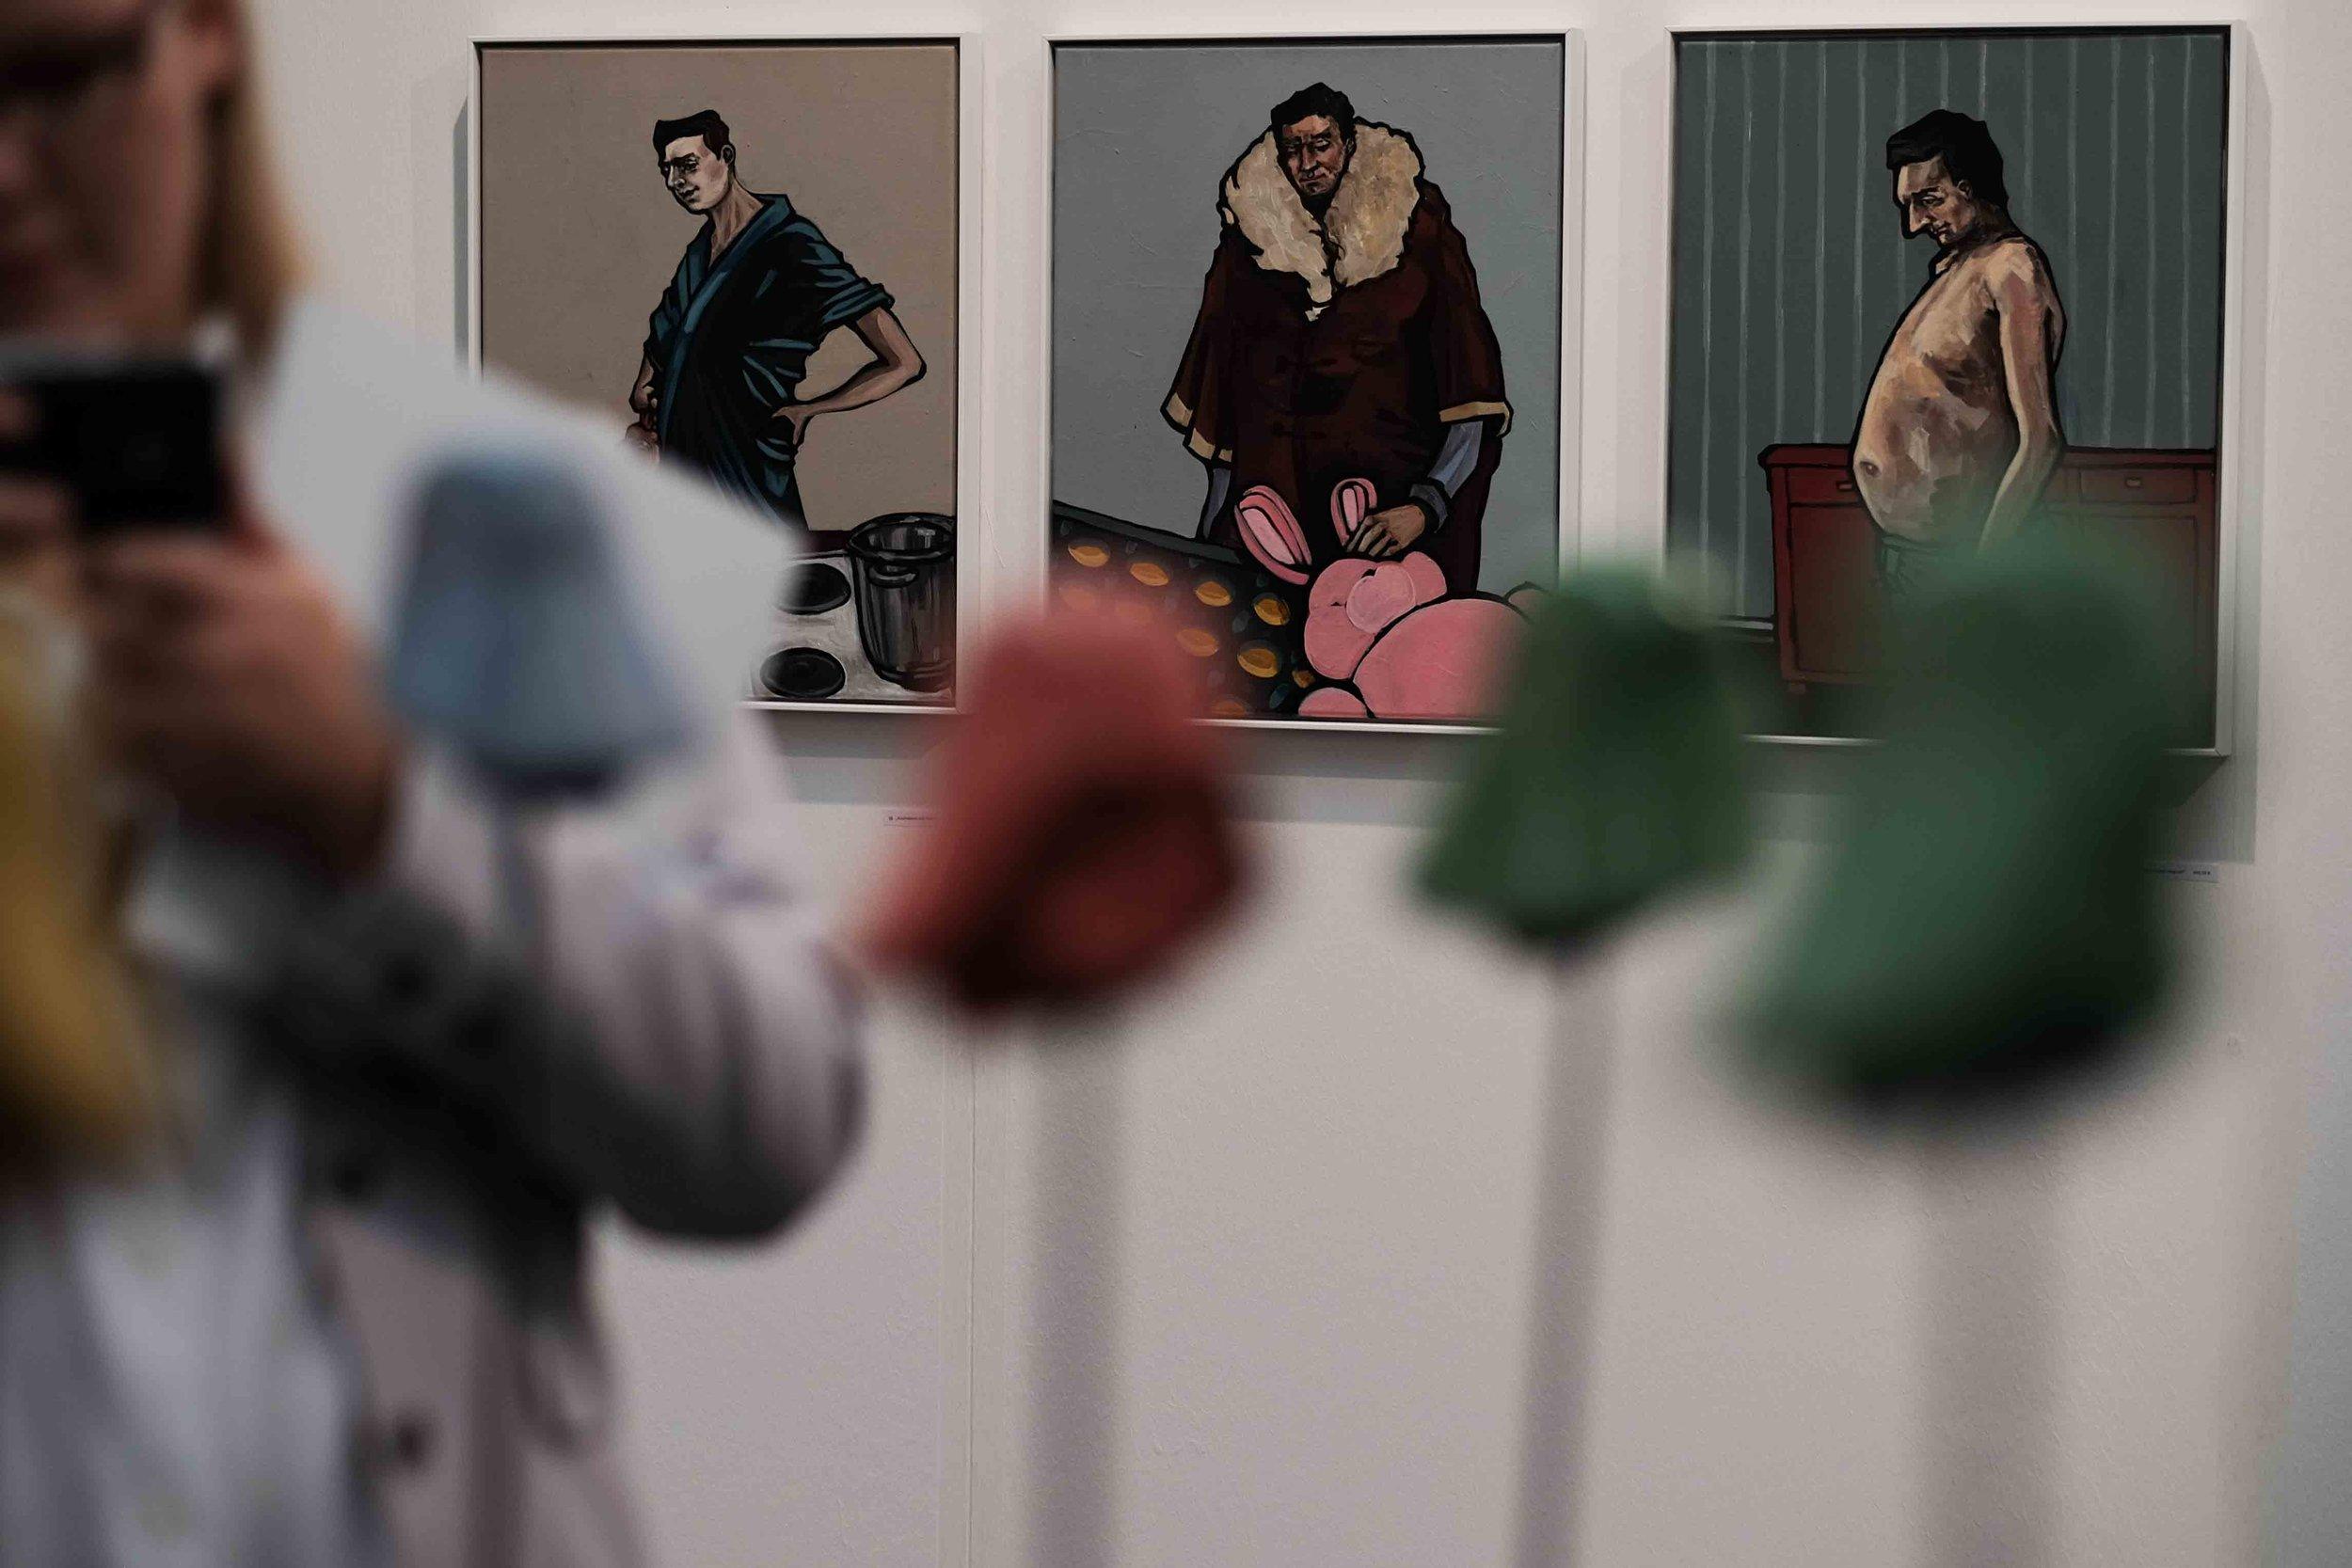 artfair-wearecity-2016-simonhariman-atheneadiapoulis-100.jpg